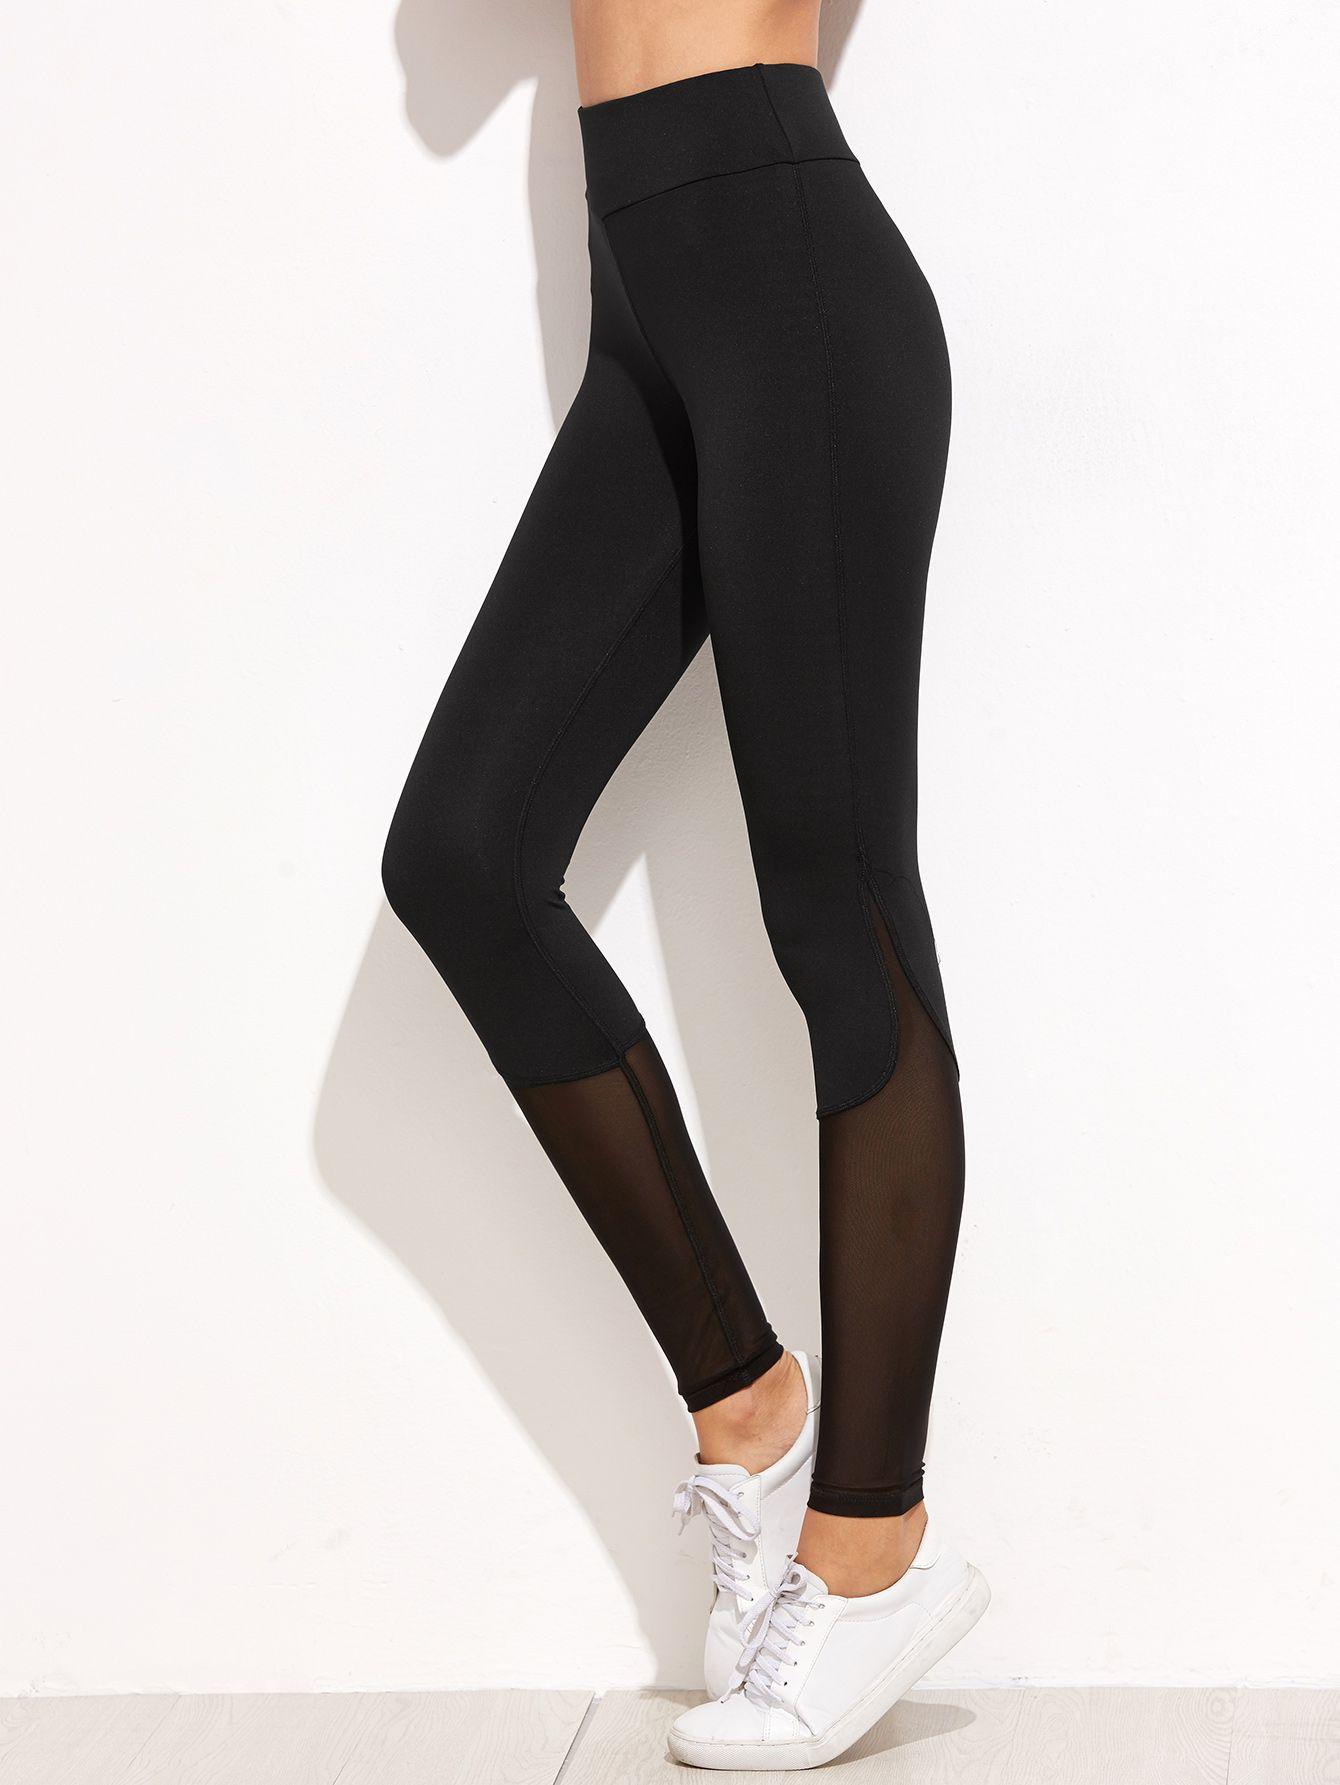 30cb2a6bd8766 Black Contrast Mesh Leggings -SheIn(Sheinside) | Clothes n Stuff in ...